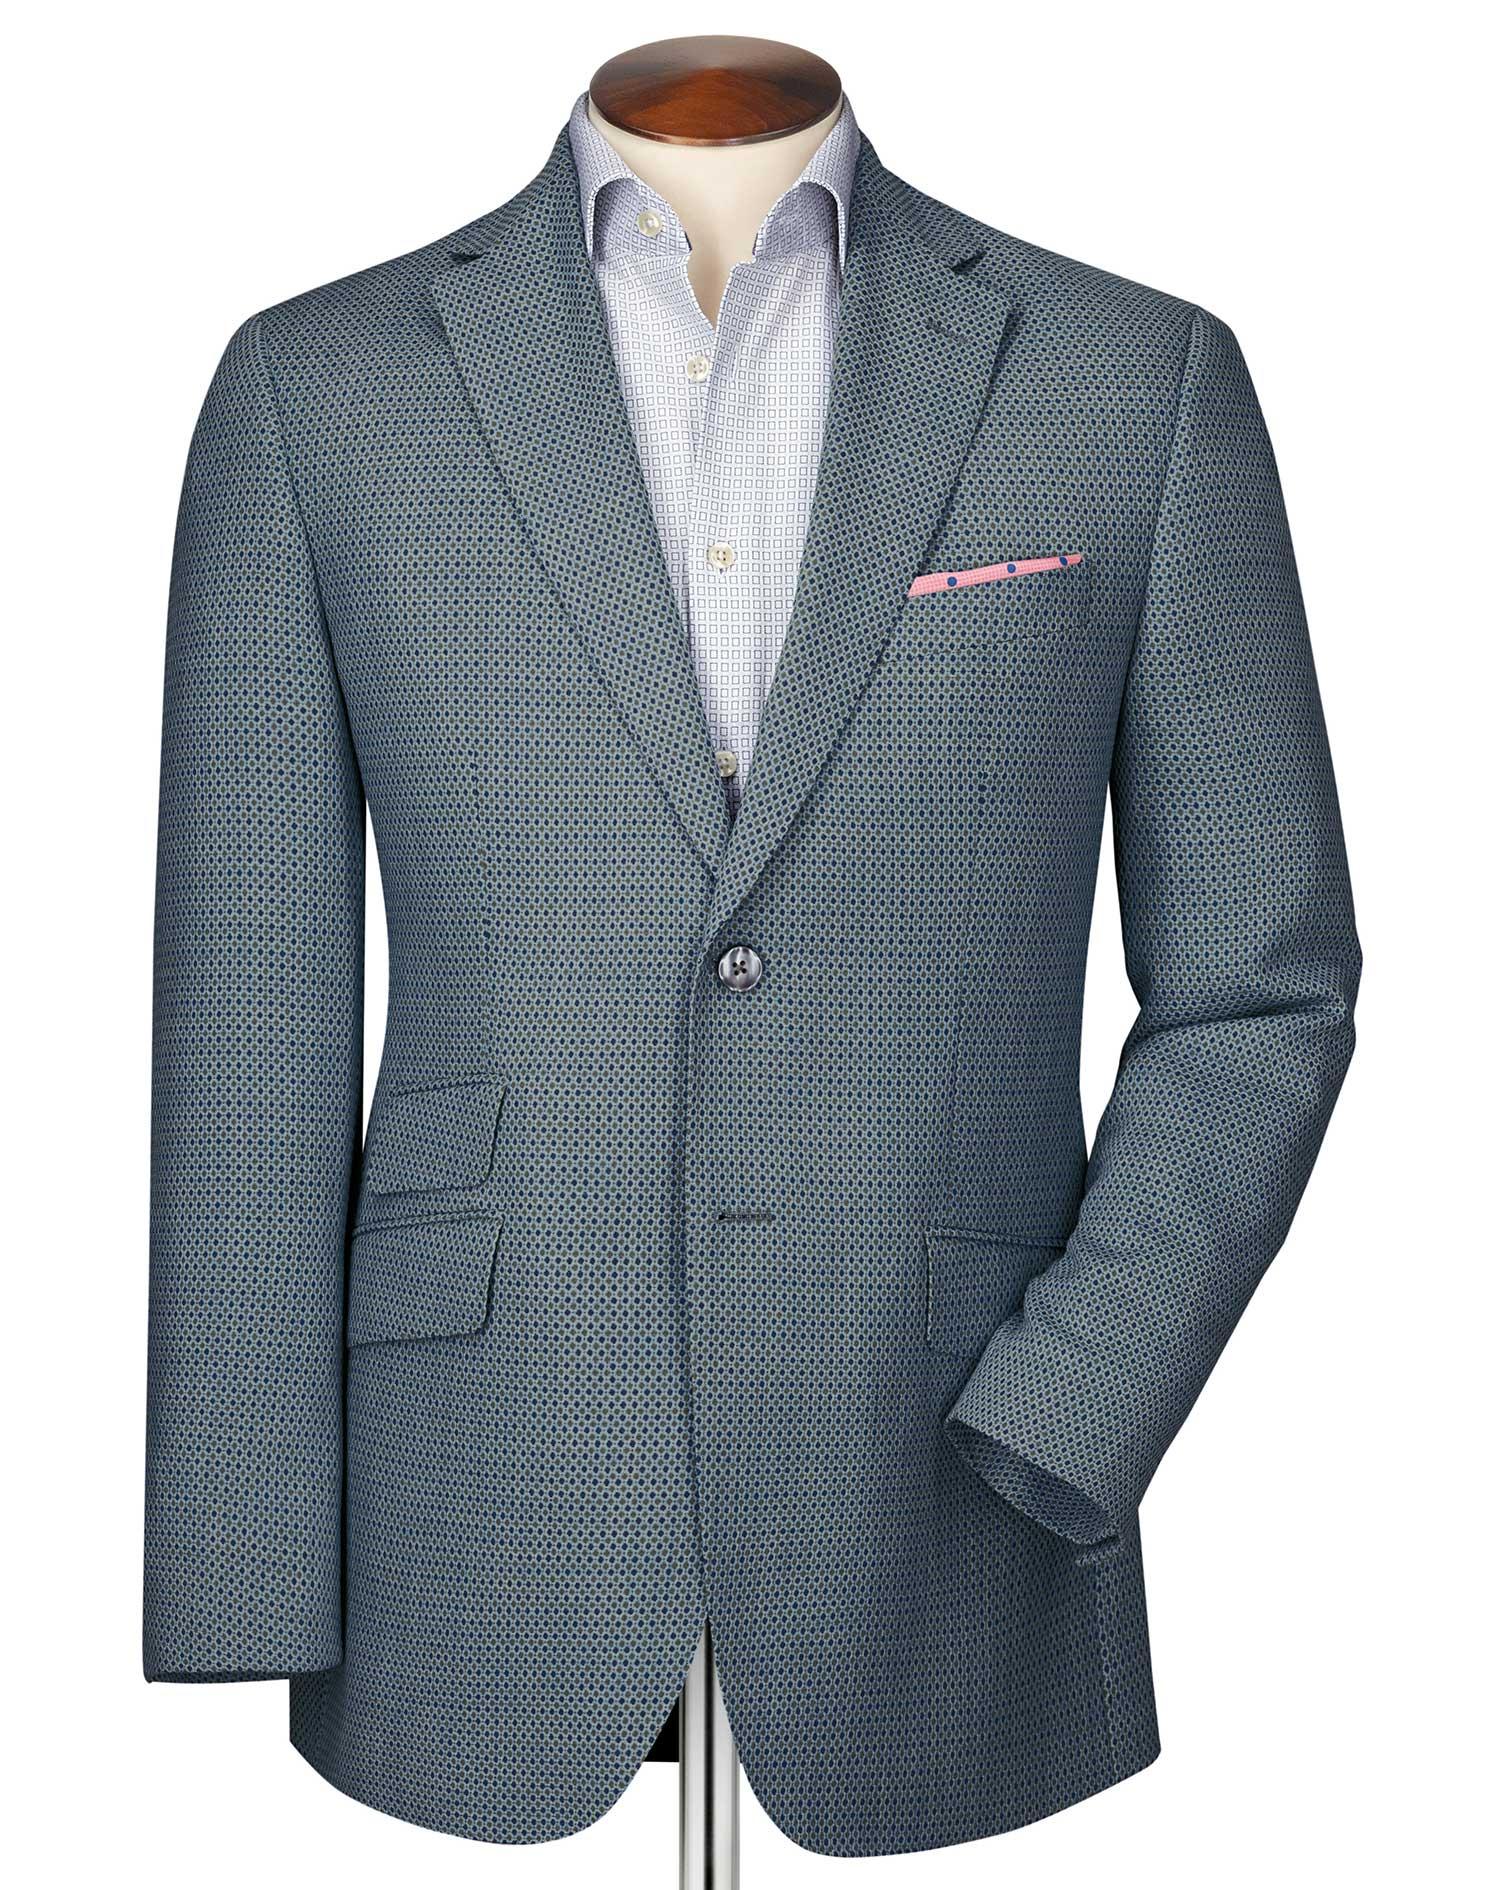 Slim Fit Grey Birdseye Wool Wool Jacket Size 38 Long by Charles Tyrwhitt